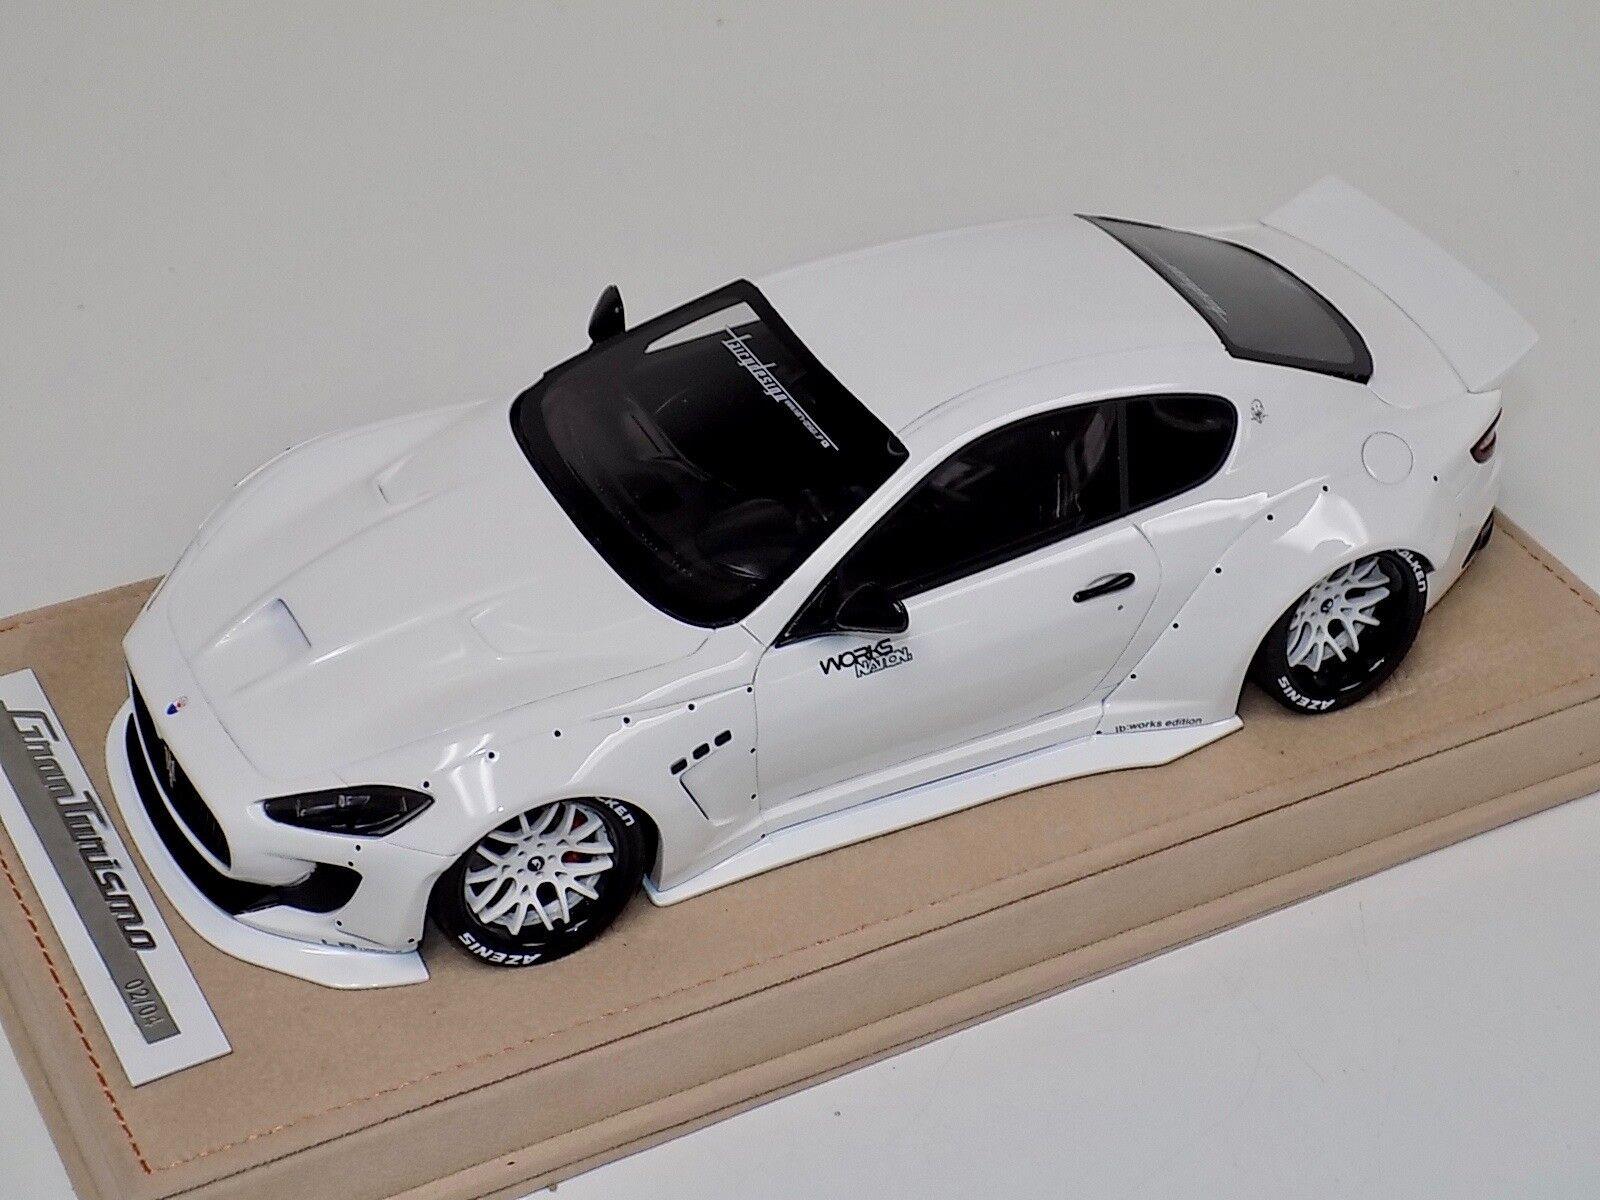 Modelos Maserati GranTurismo Liberty AB Caminar Blanco Ruedas no dcls Alcantara